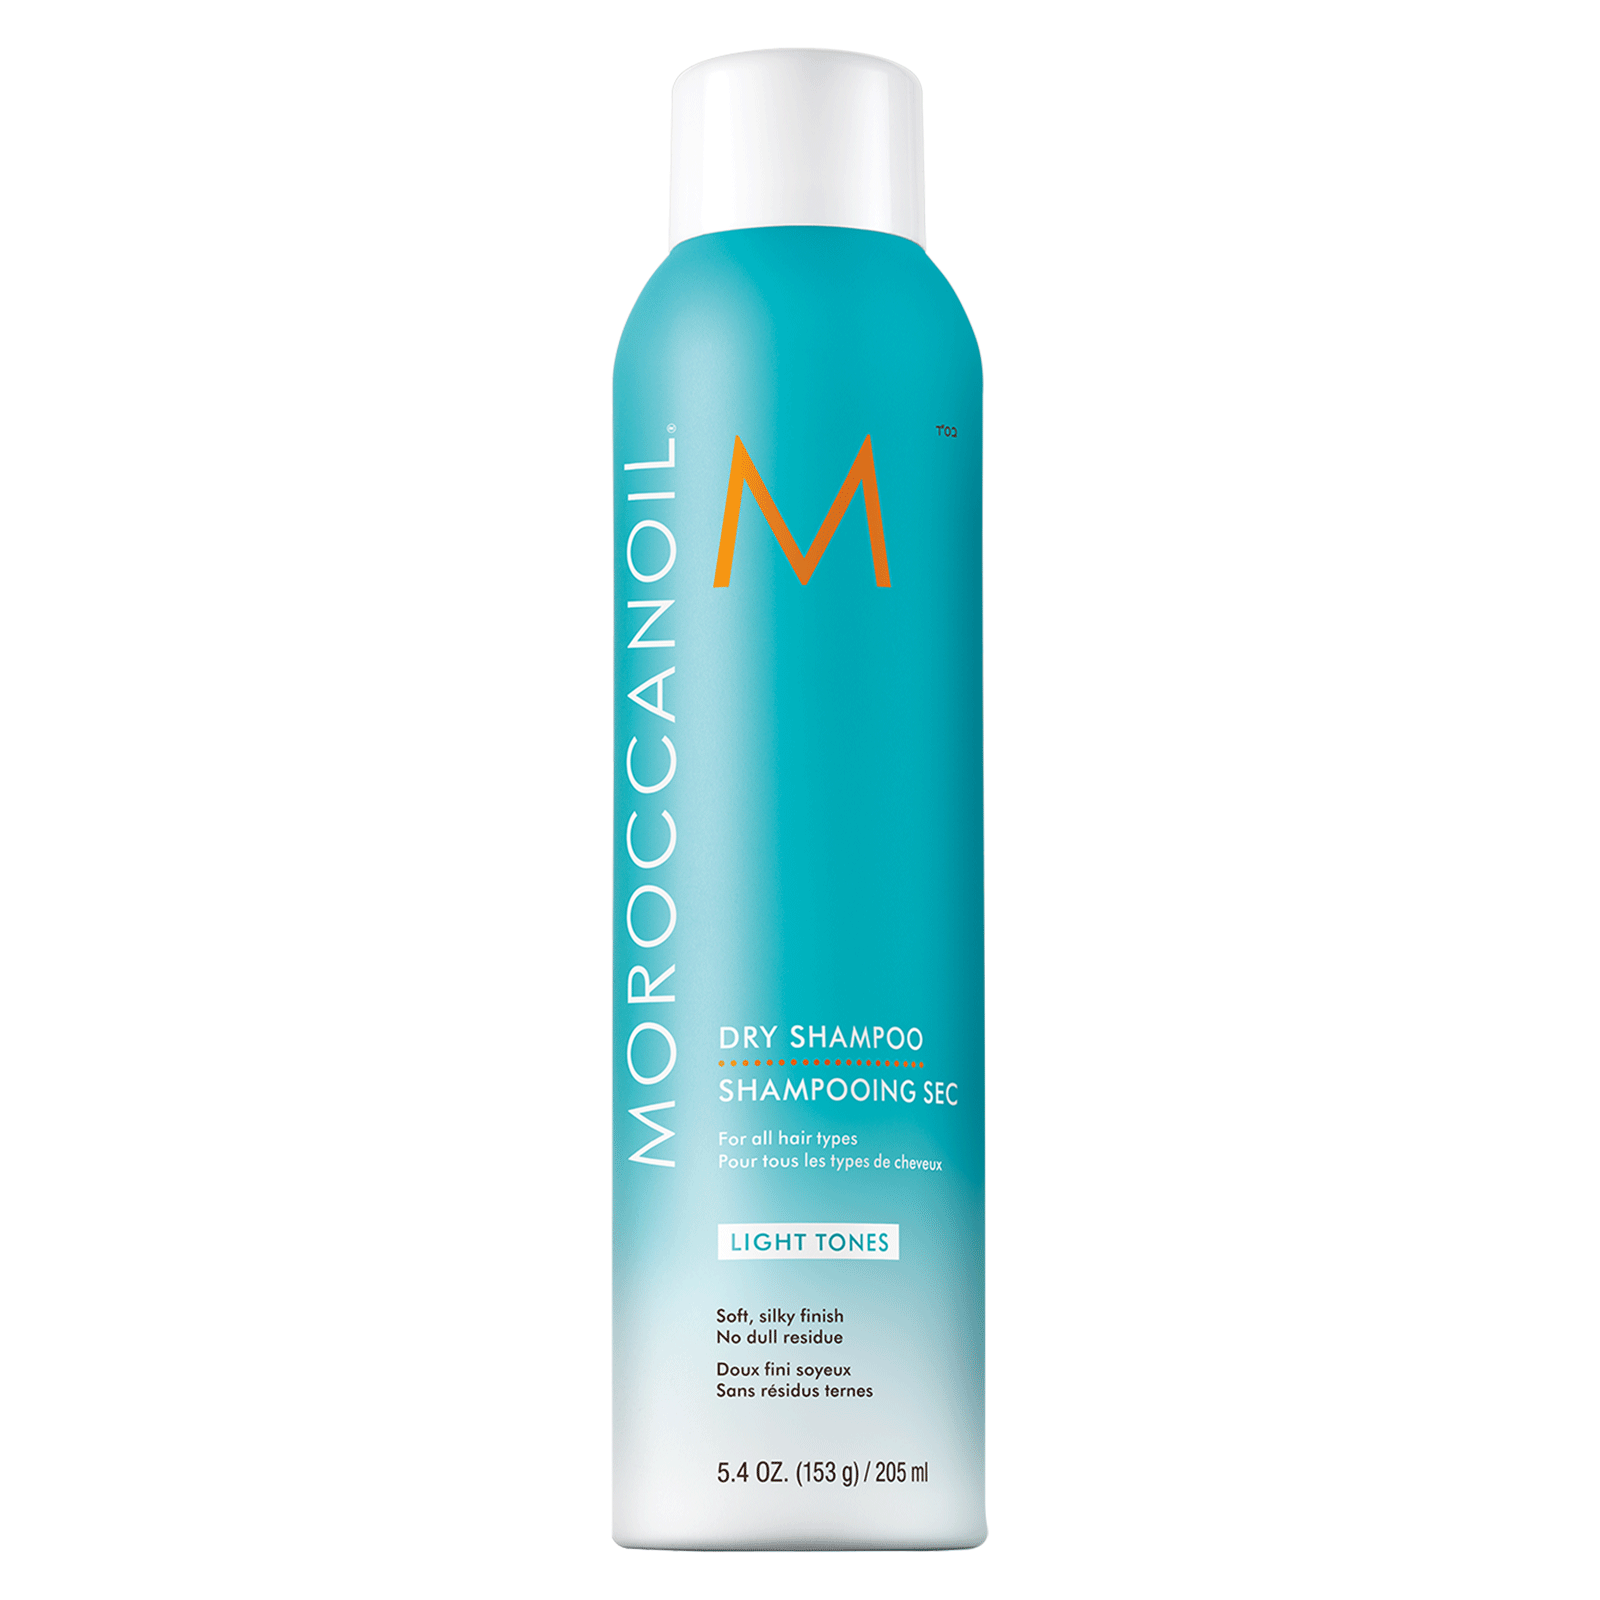 Dry Shampoo - Light Tone - Moroccanoil | CosmoProf